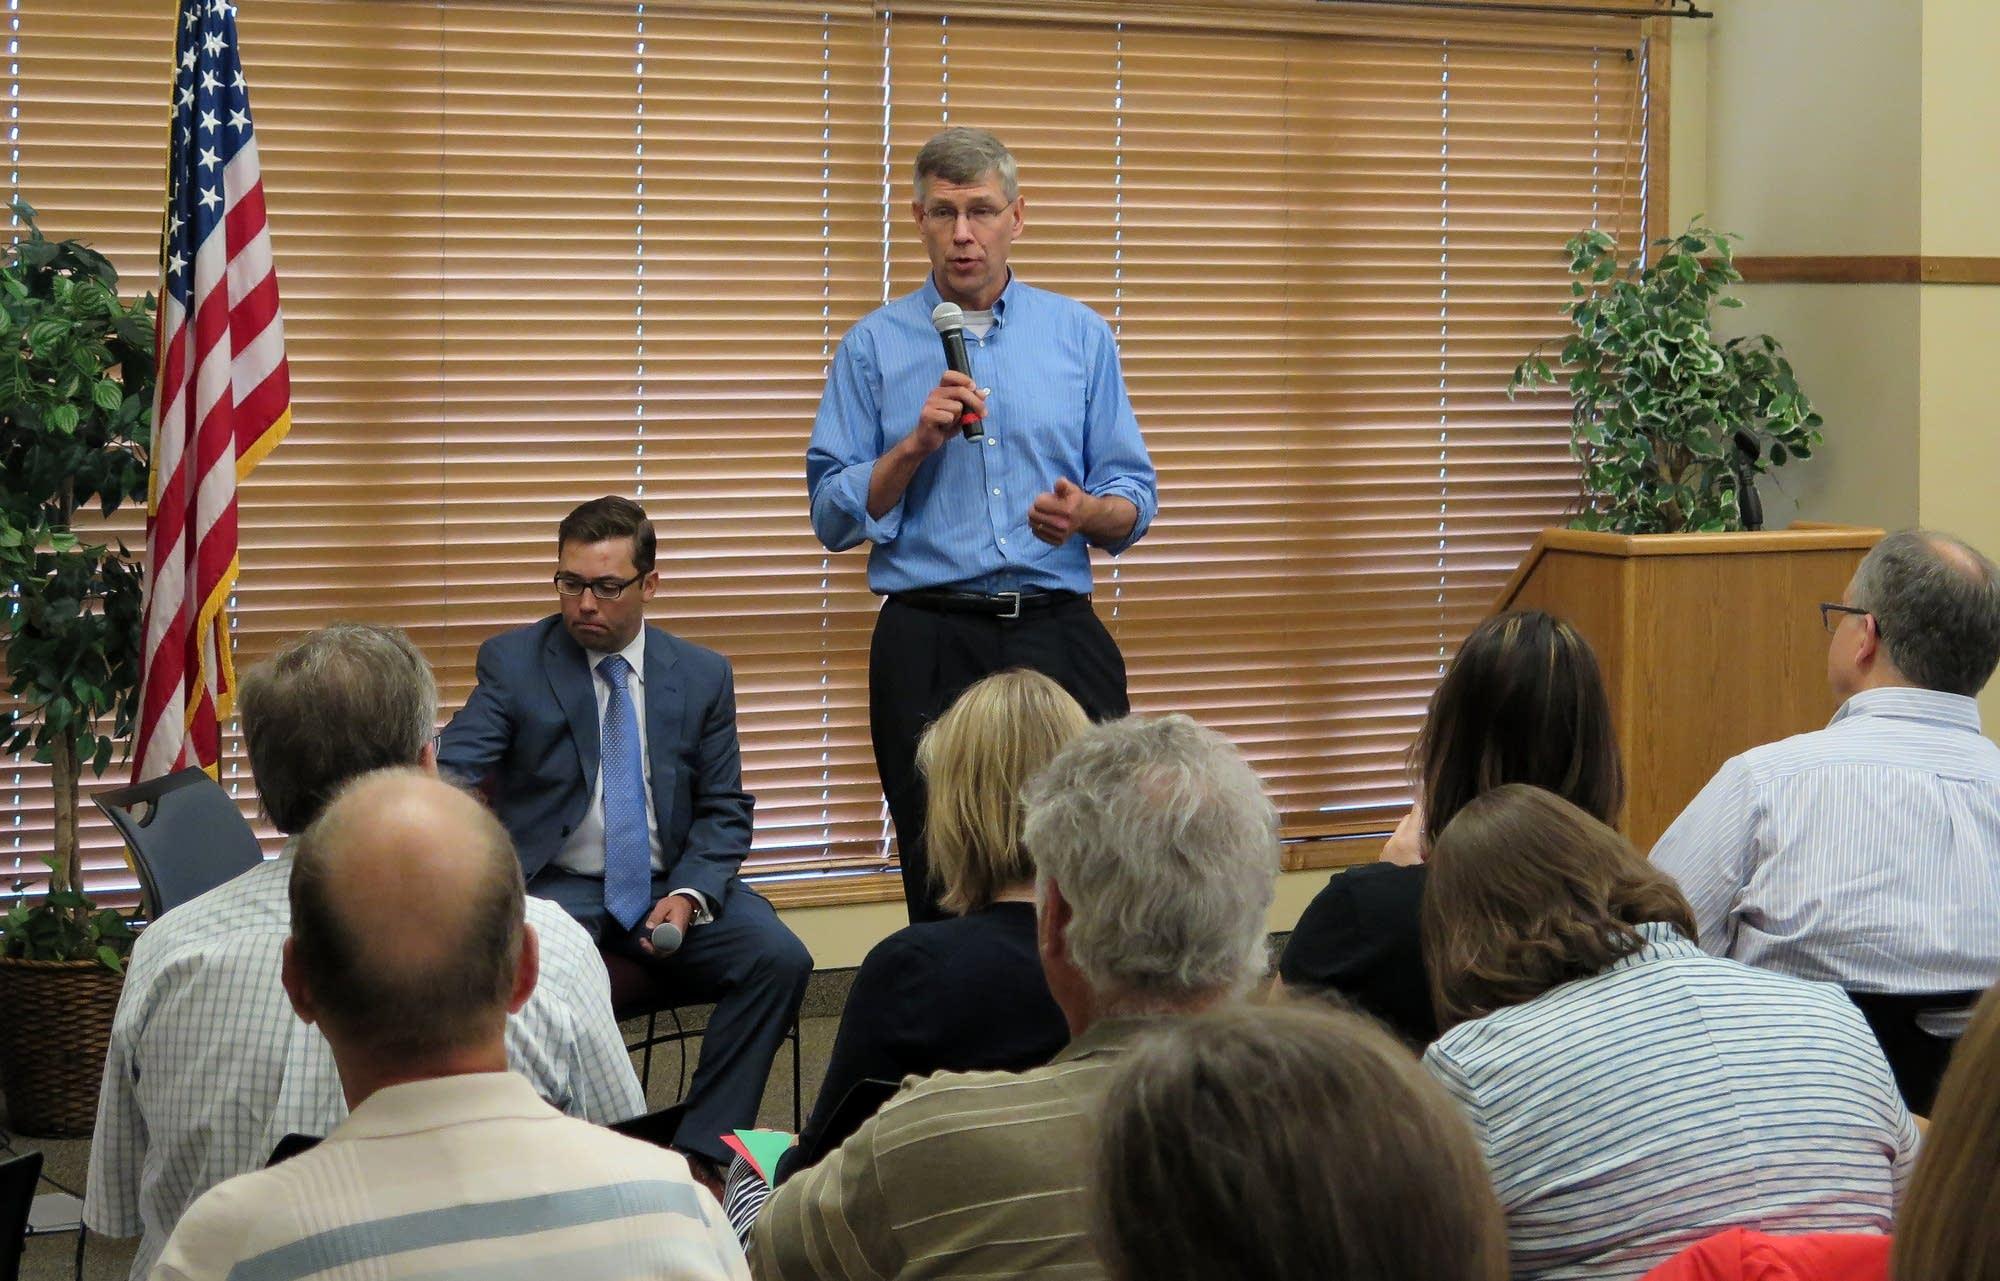 Third District Republican Congressman Erik Paulsen spoke at a town hall.